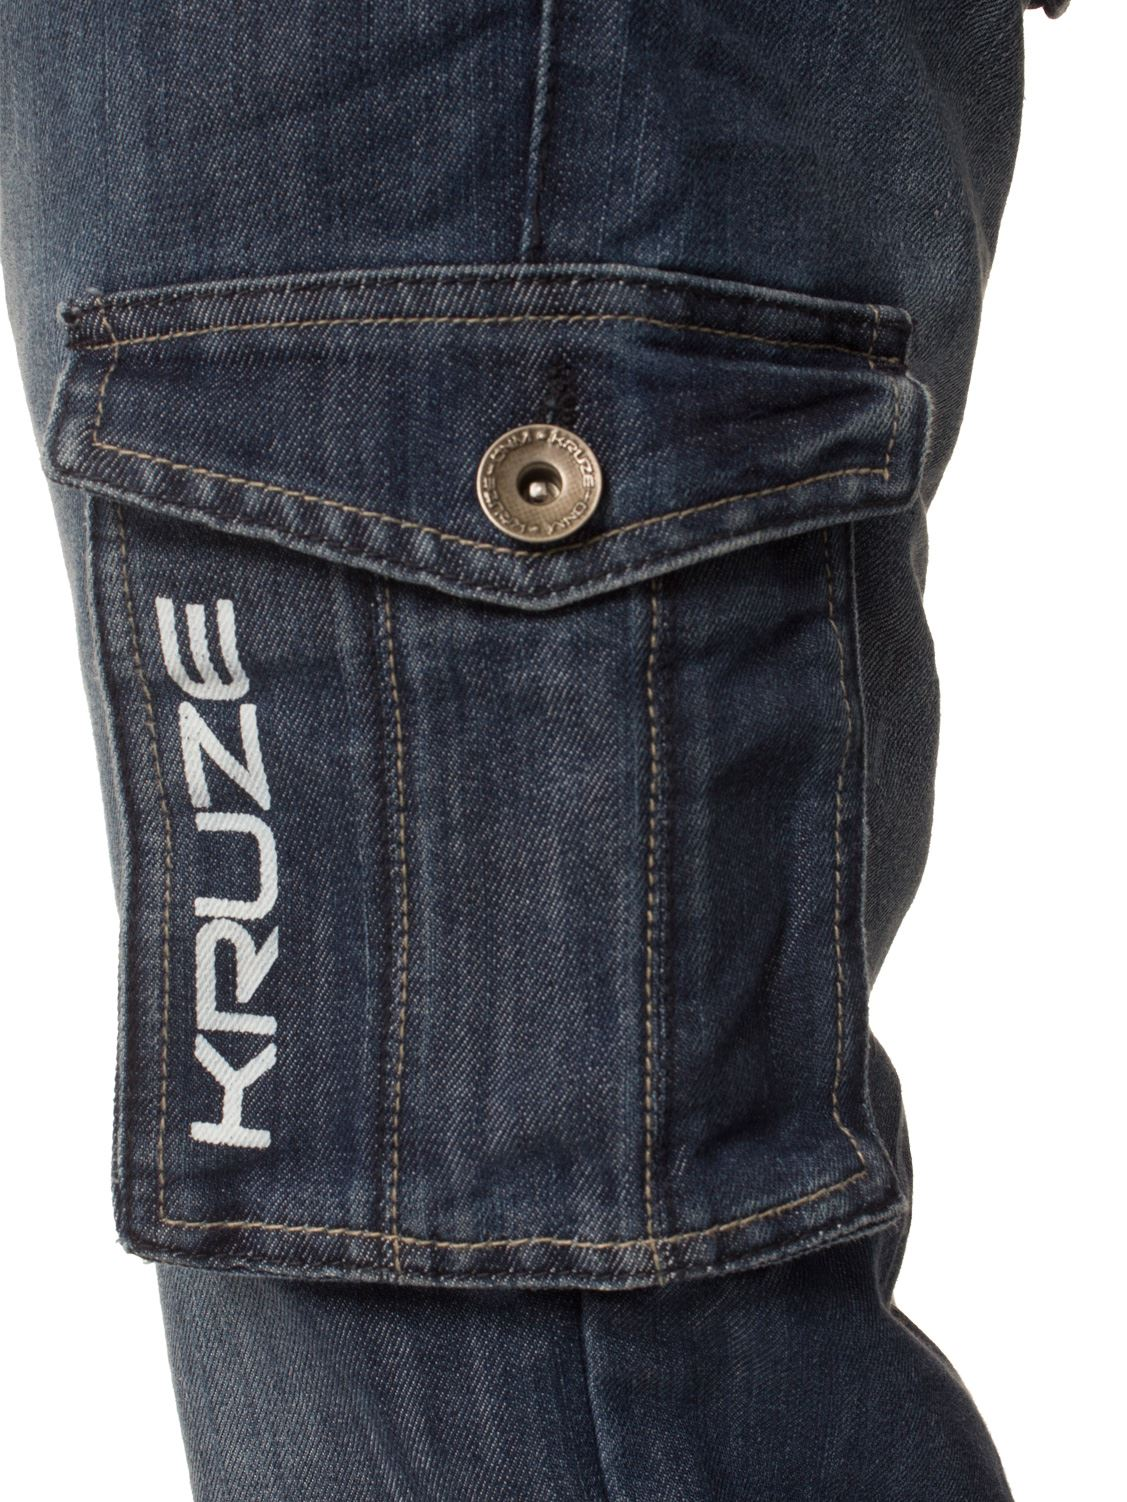 Grandes-jeans-para-hombre-de-combate-de-Kruze-Rey-Alto-Pierna-Cargo-Pantalones-Jeans-Pantalones miniatura 8